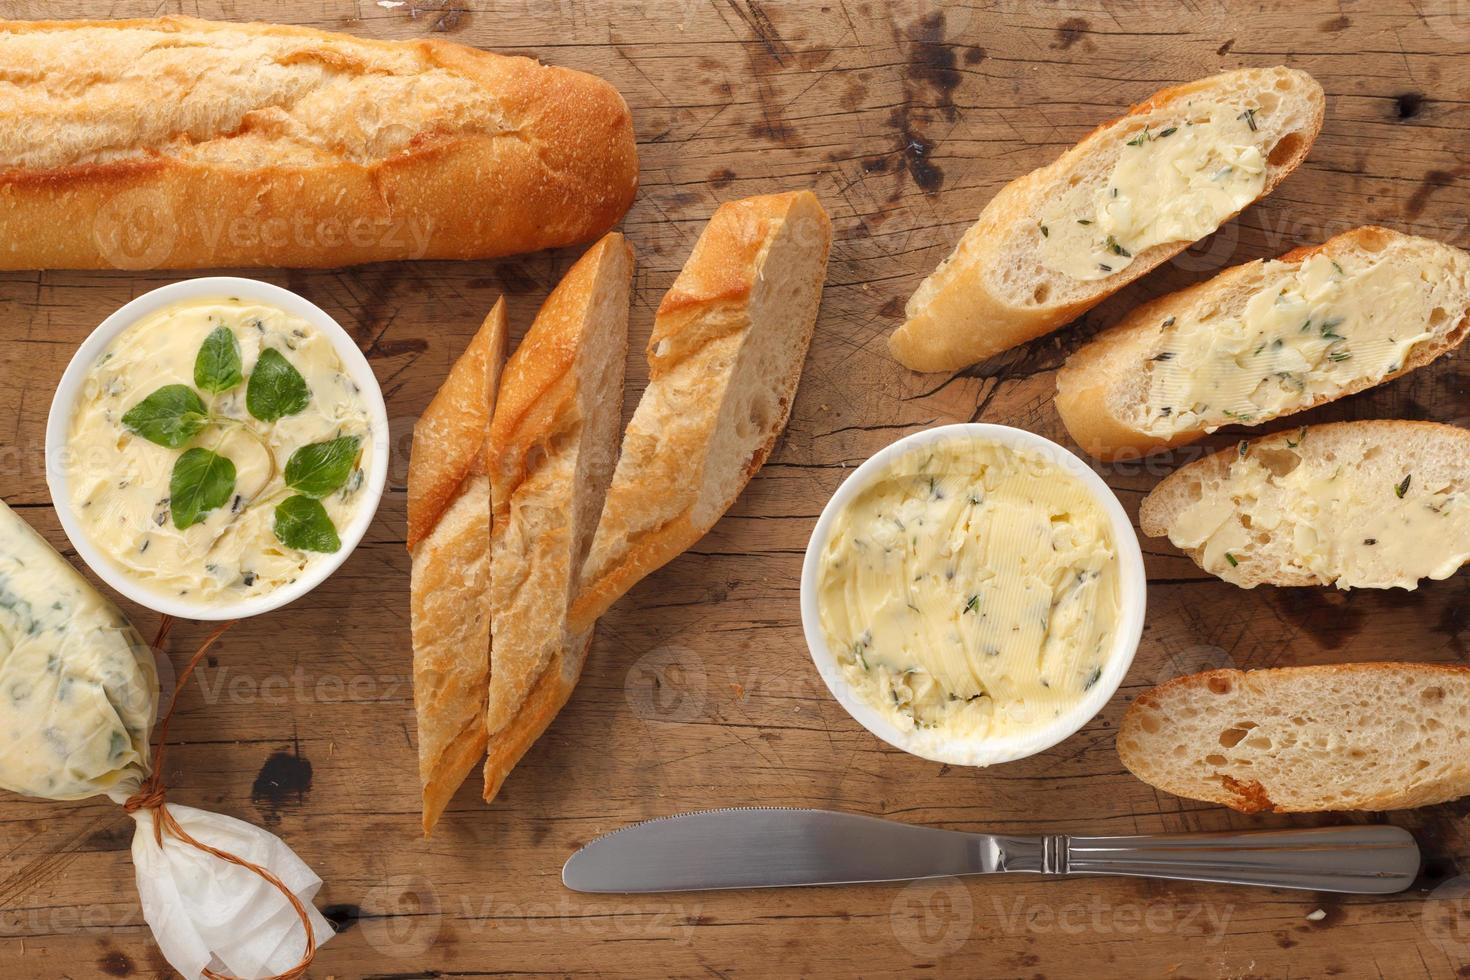 garlic bread compound butter herb baguette thyme rosemary coriander oregano photo